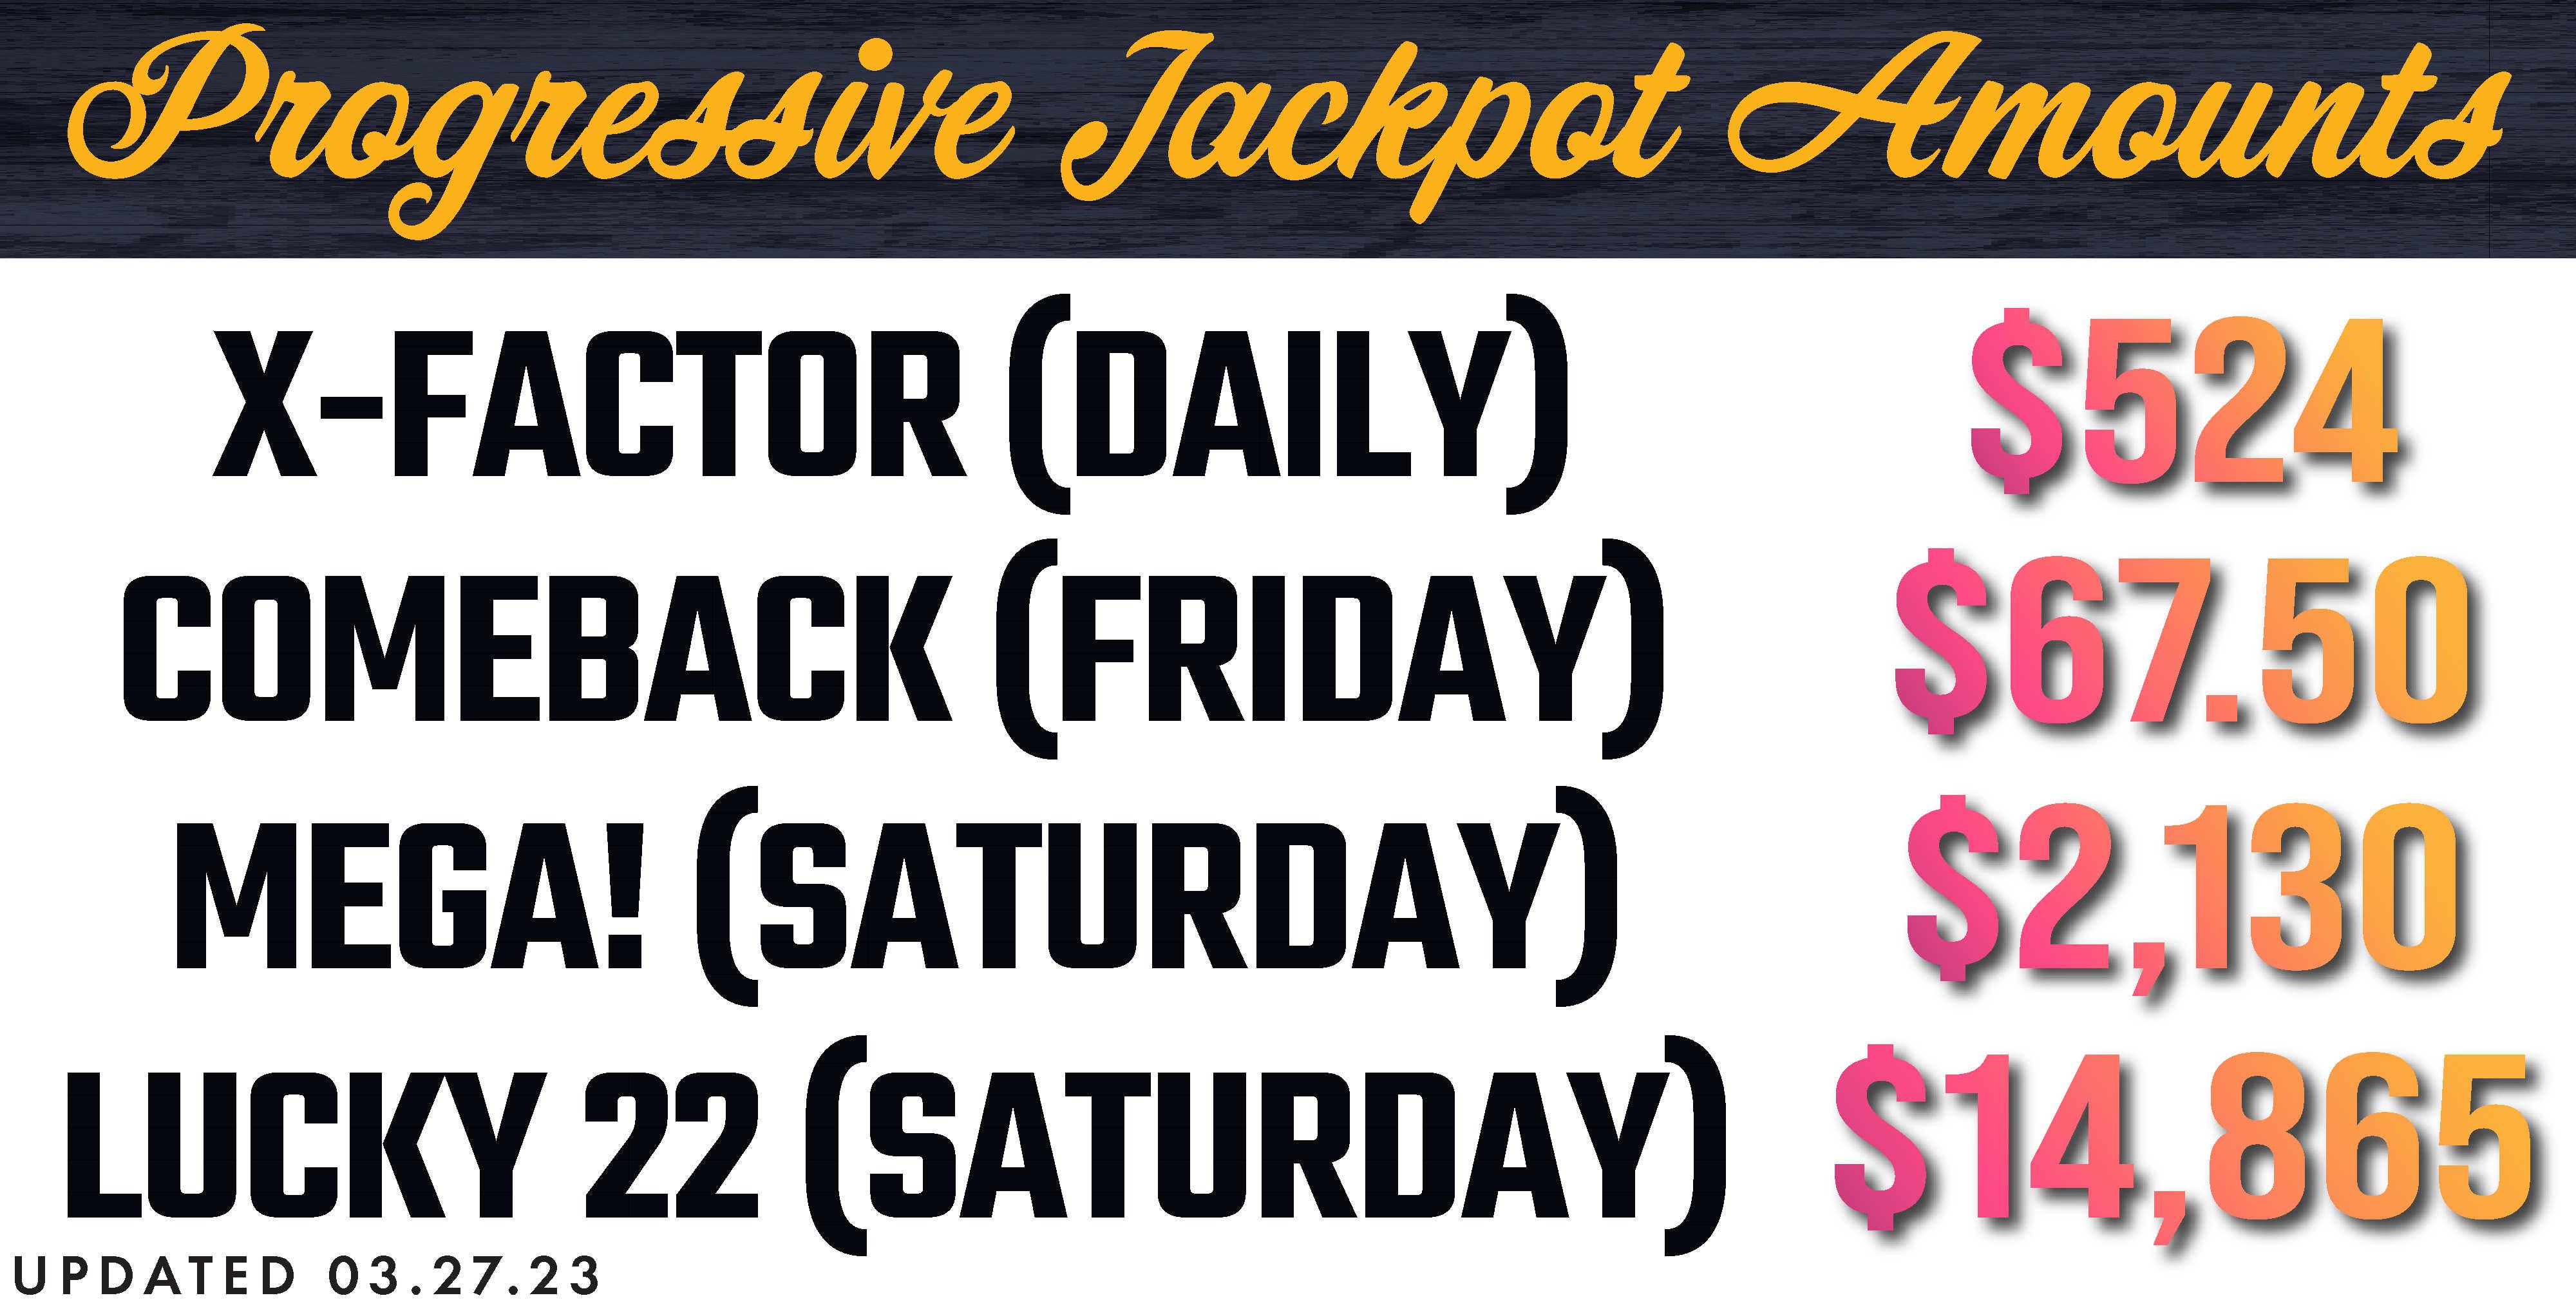 Monte carlo progressive jackpot amounts